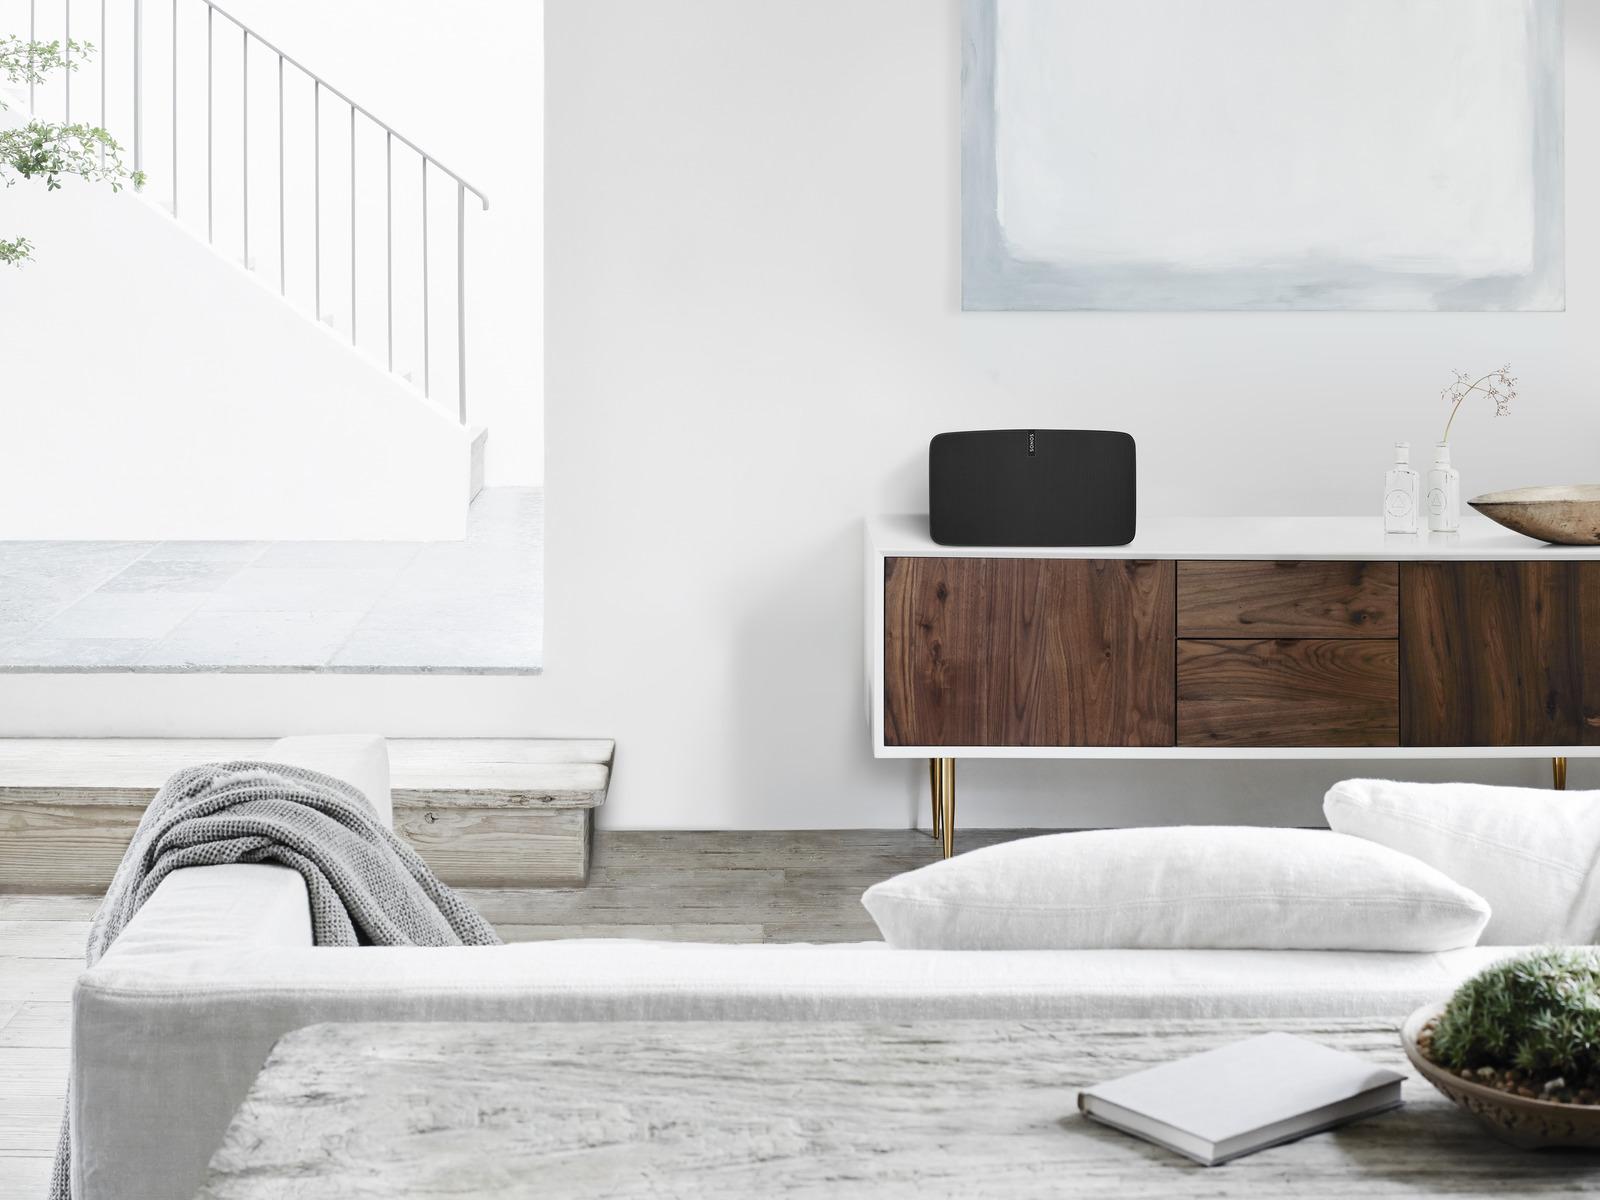 Home-Audio-Systems-Sonos-speaker-scandanavian-style-living-room